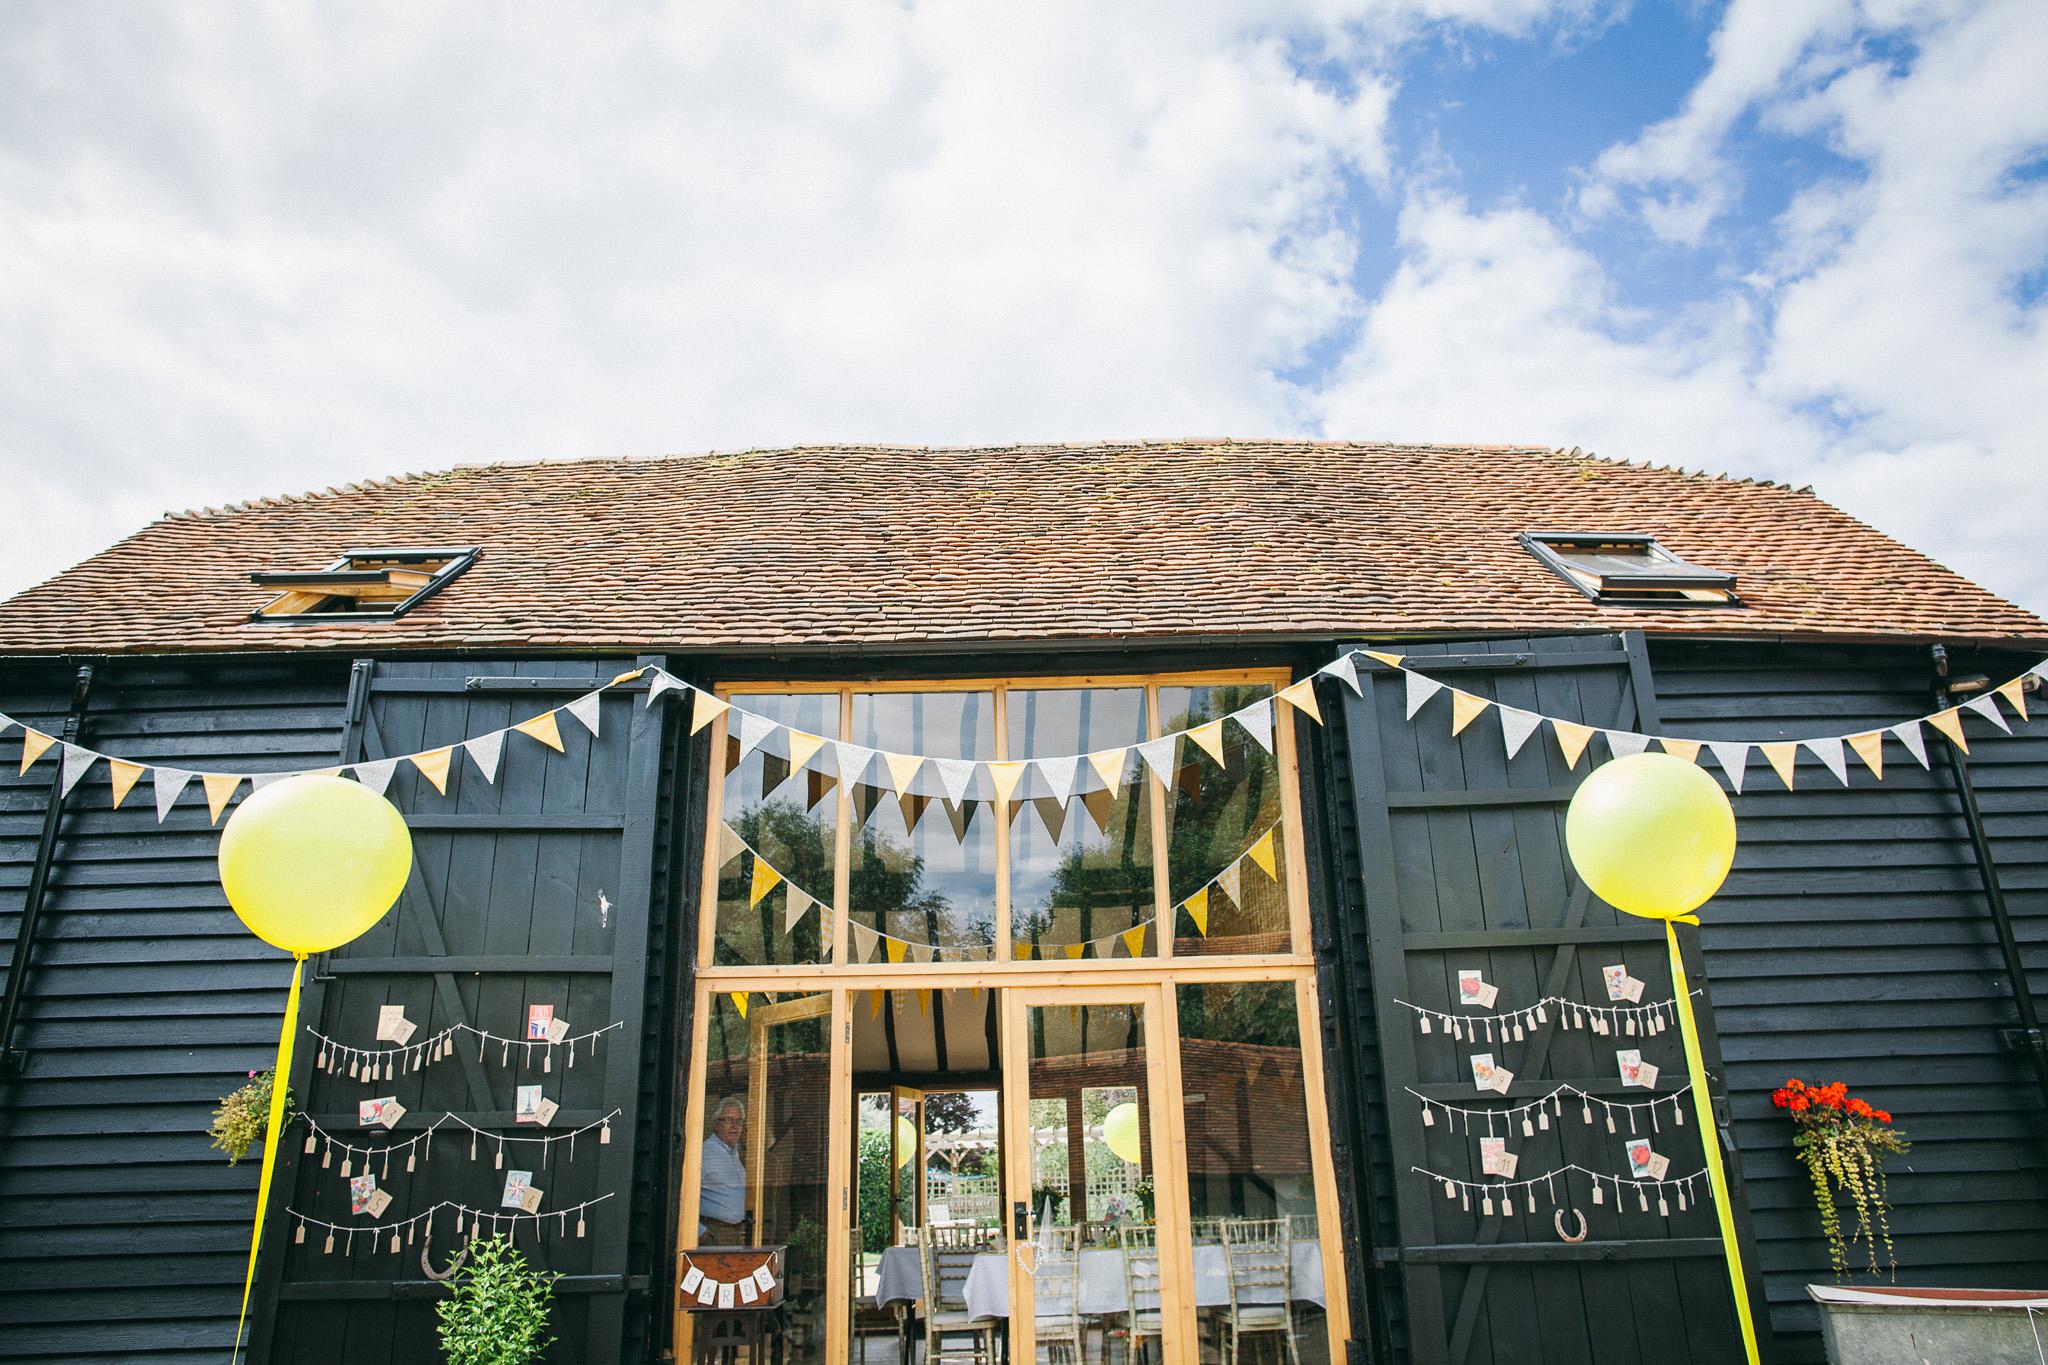 chantry_sussex_barn_wedding_285.jpg